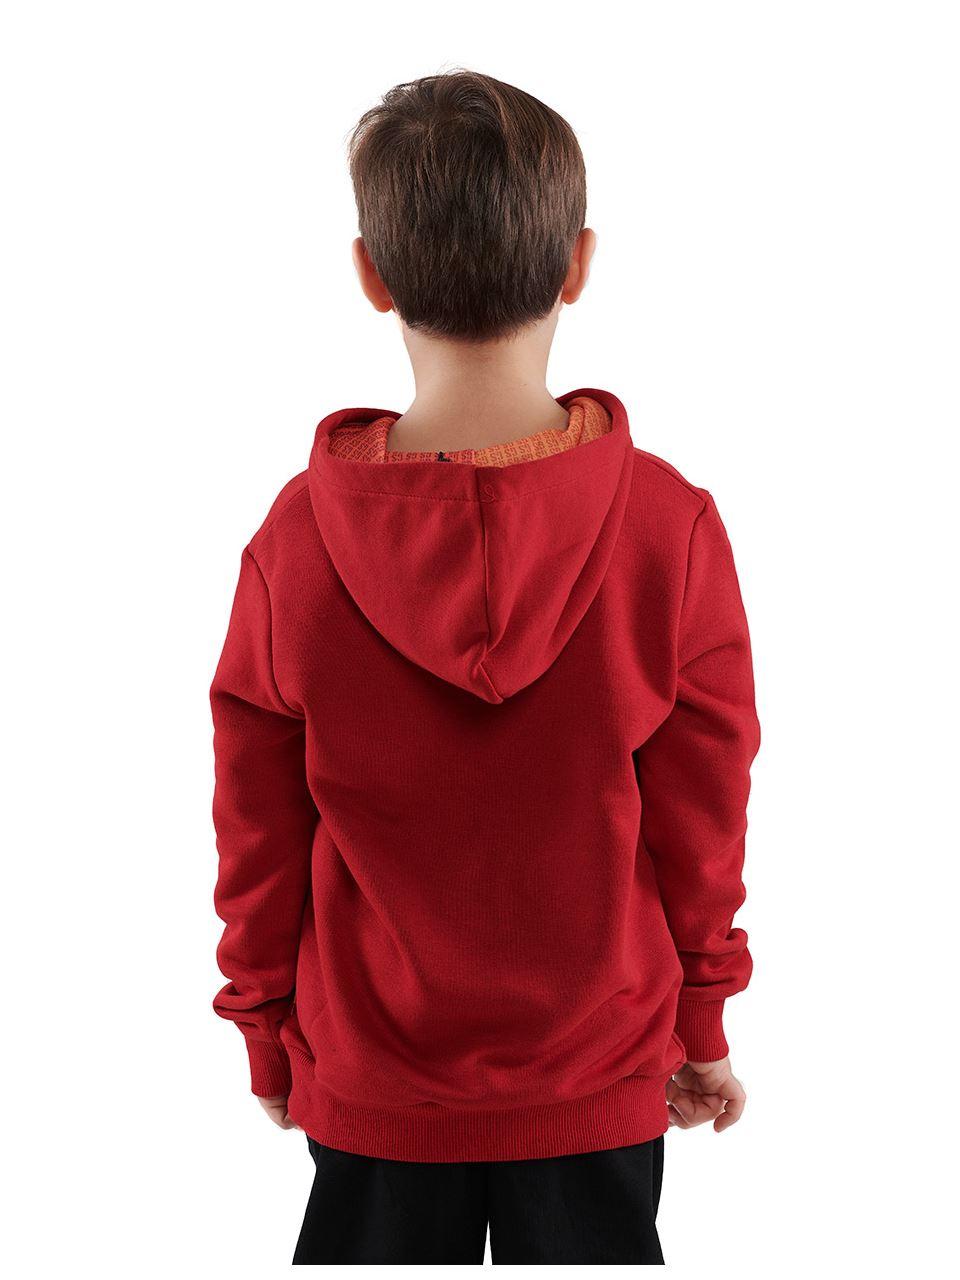 C95066 Sweatshirt